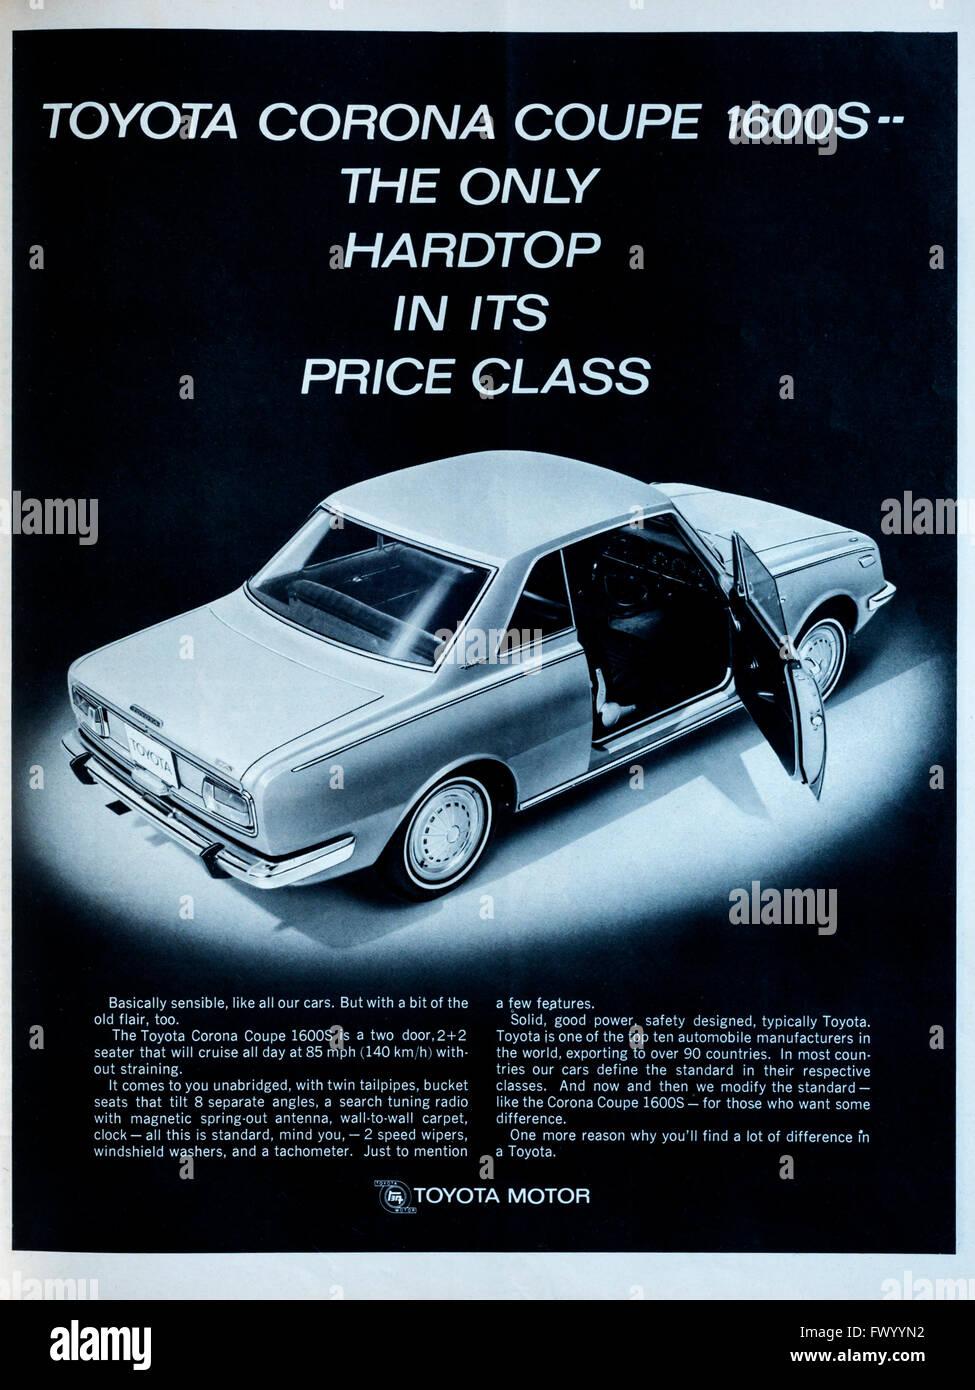 Corona Auto Sales >> 1960s magazine advertisement advertising the Toyota Corona Coupe Stock Photo - Alamy